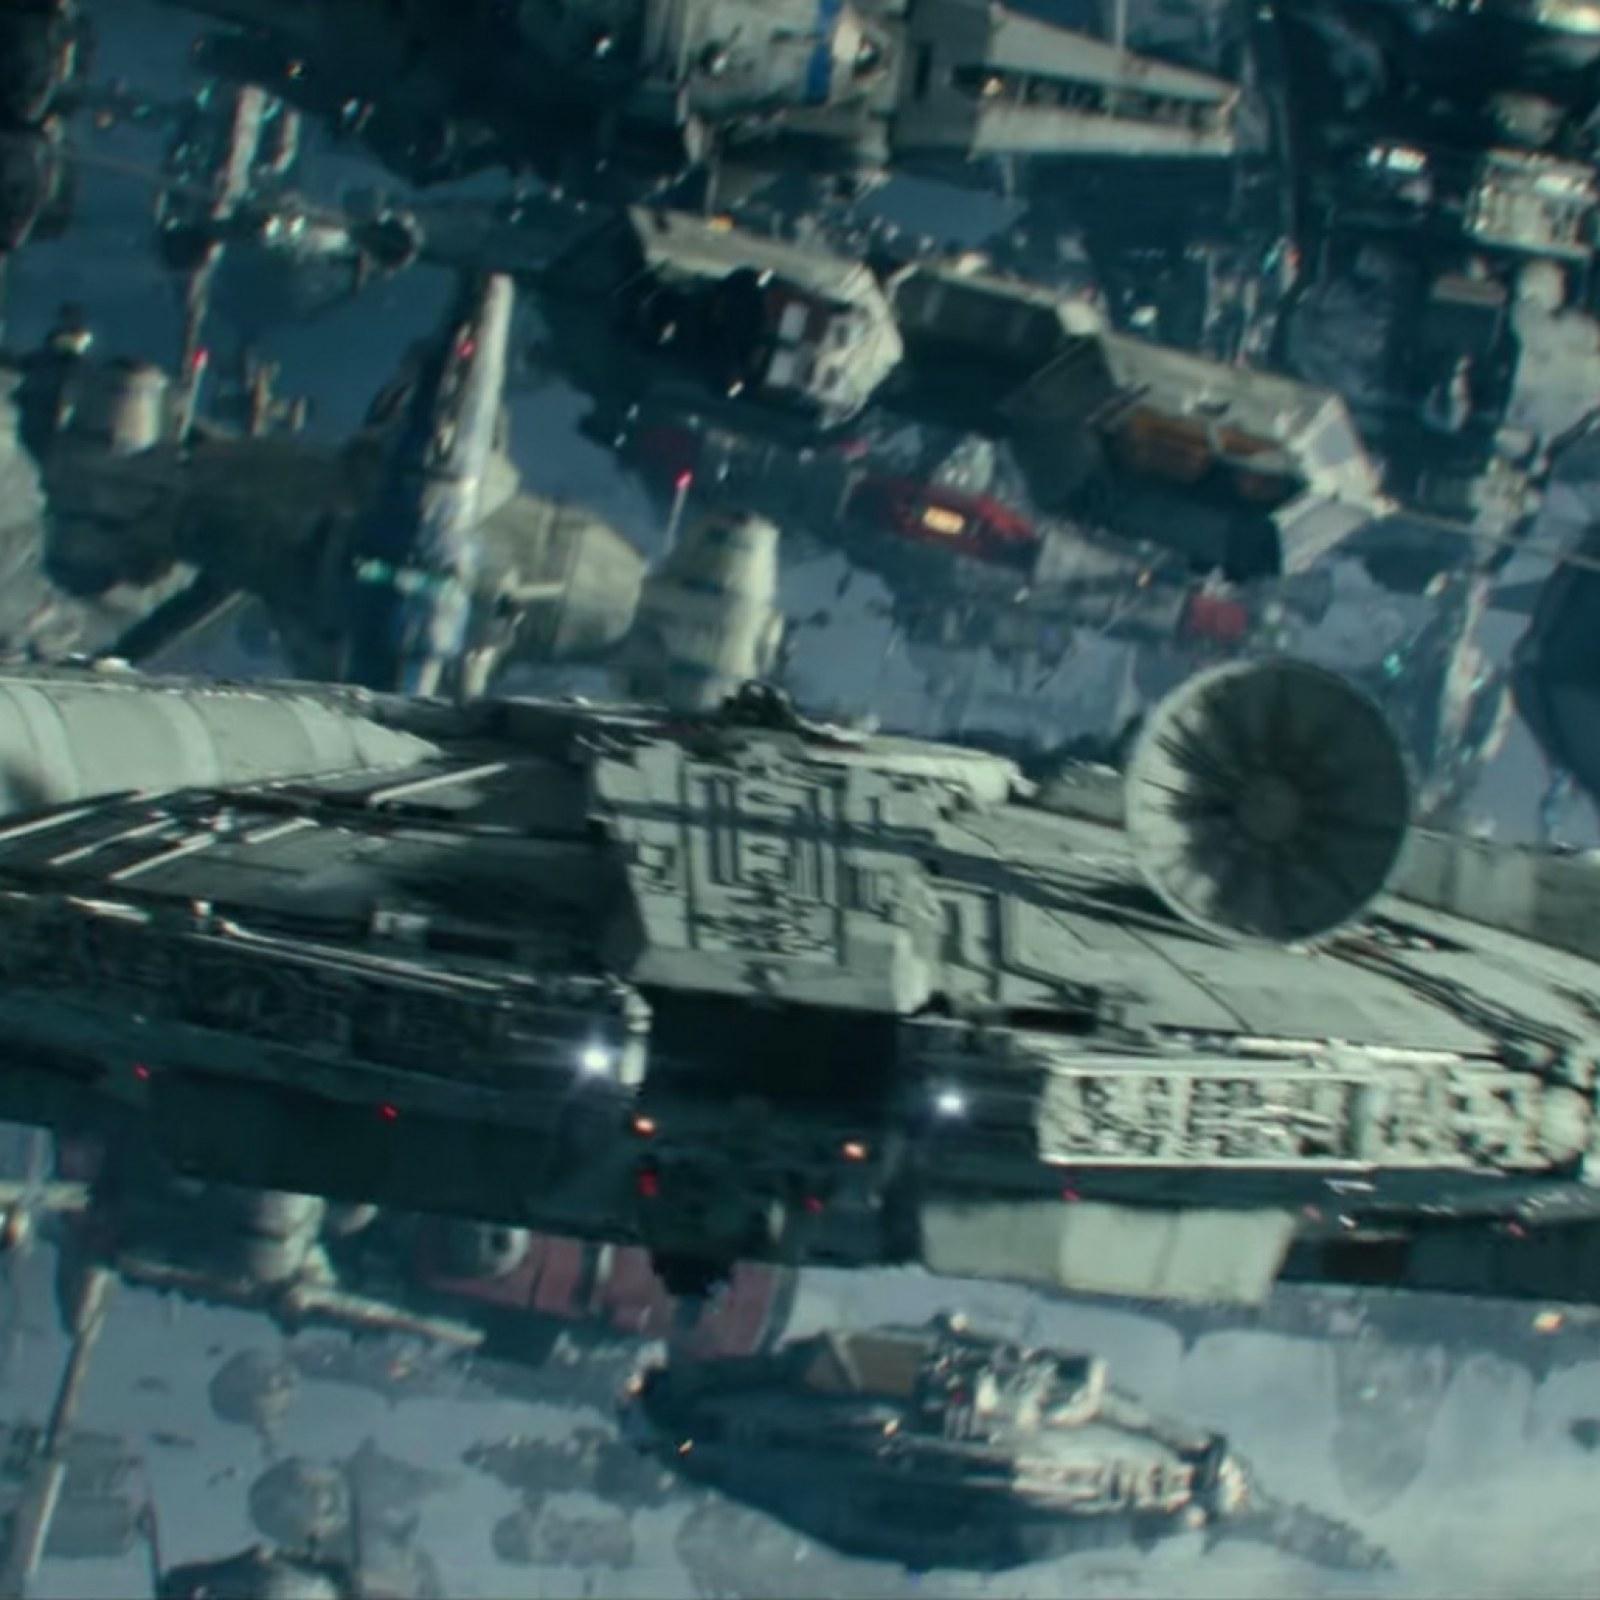 Star Wars The Rise Of Skywalker Spoilers Trailer Teases Star Wars Rebels Ghost Appearance